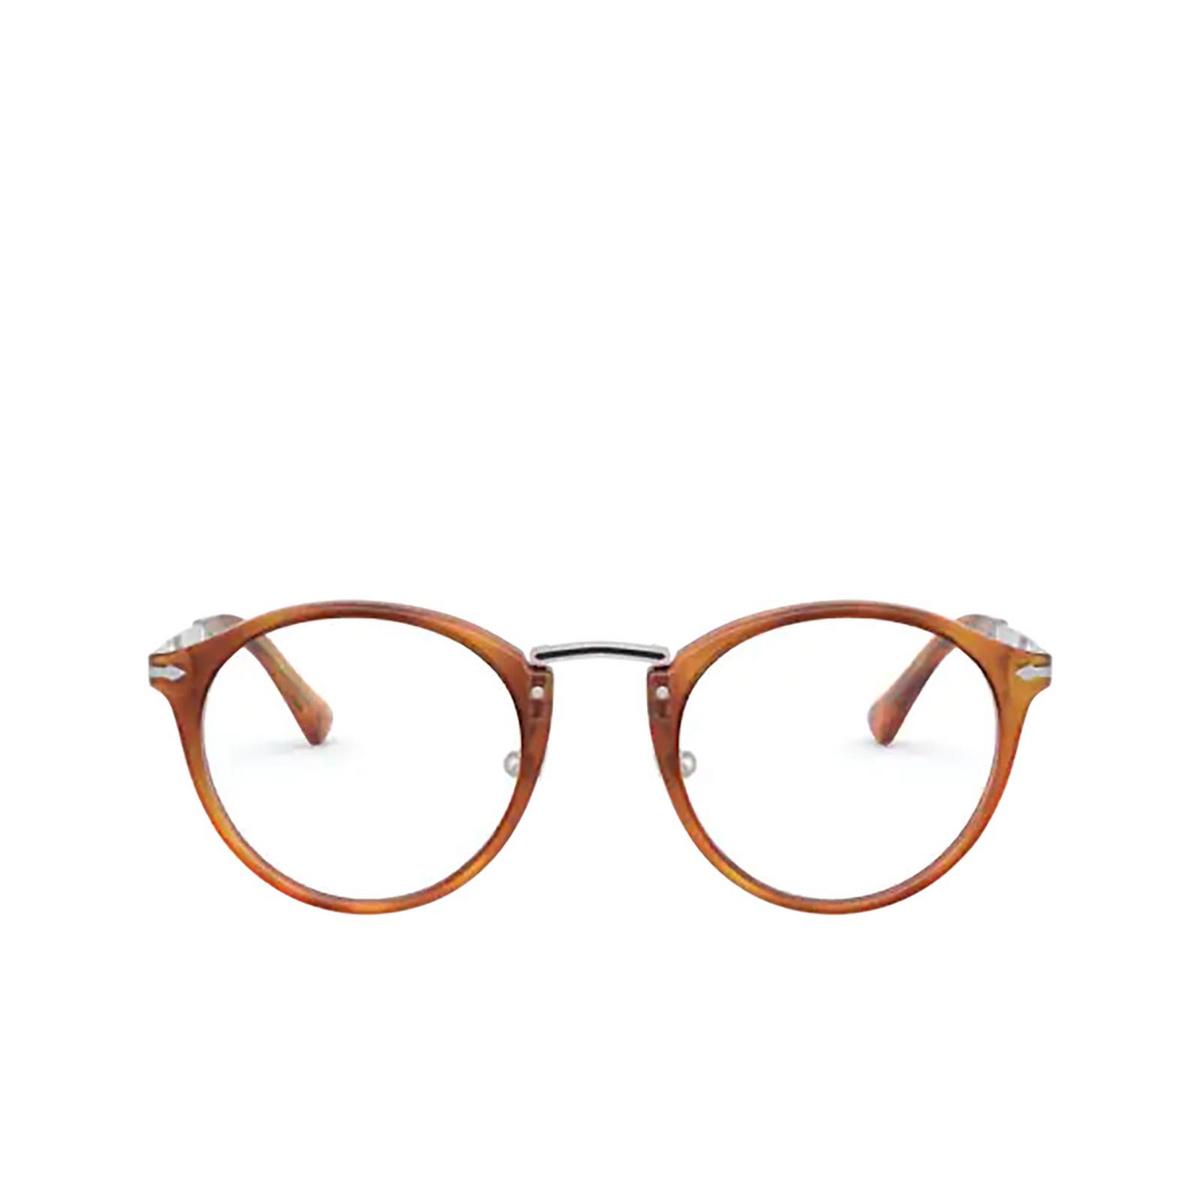 Persol® Round Eyeglasses: PO3248V color Terra Di Siena 96 - front view.